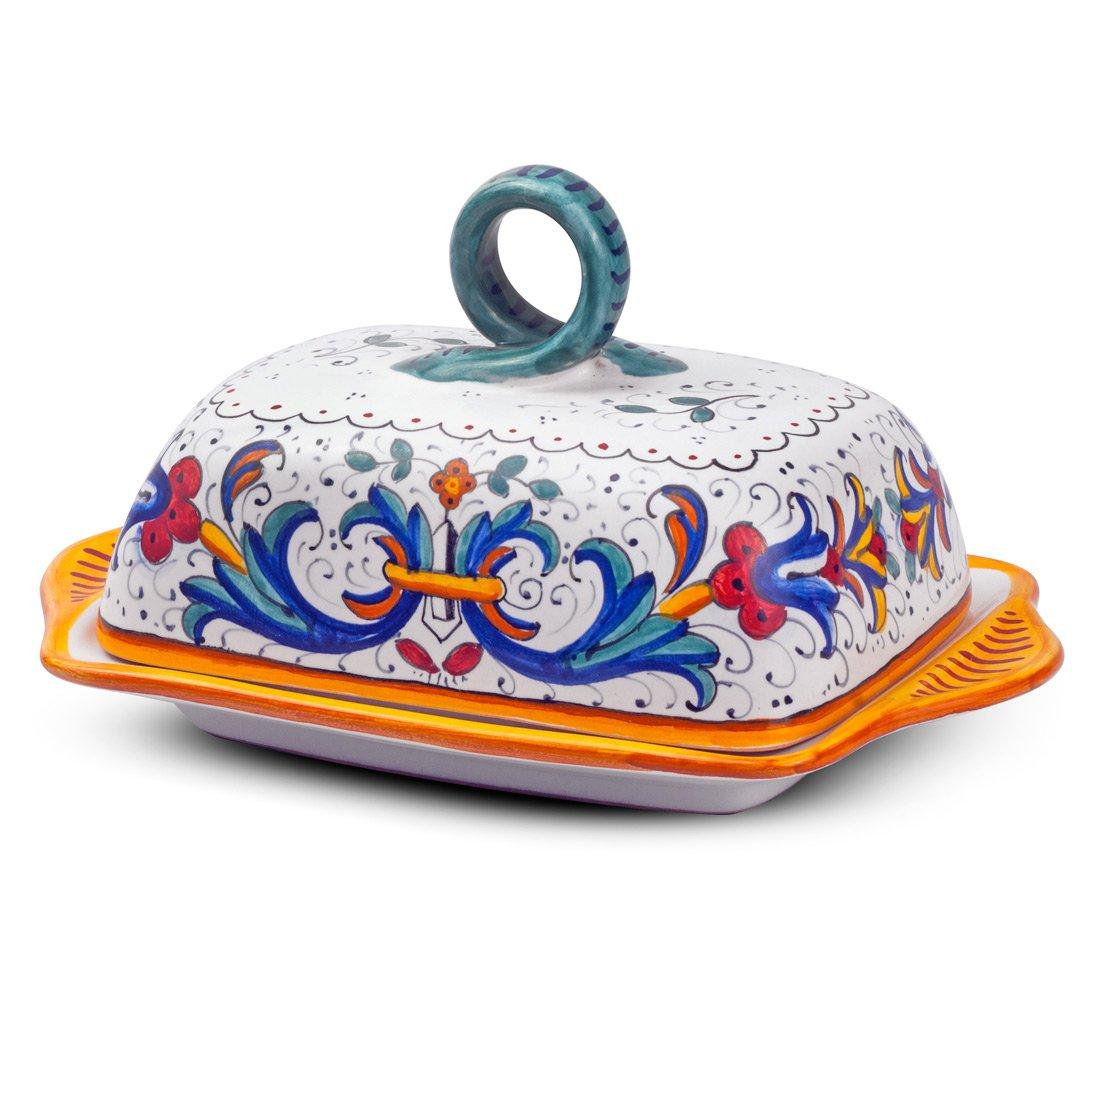 MICHELANGELO Ceramic Handpainted Italy Art & Crafts Pottery - Butter Dish, Ricco Deruta decoration, in Ceramic 20x12.5 H11 cm (BLUE)